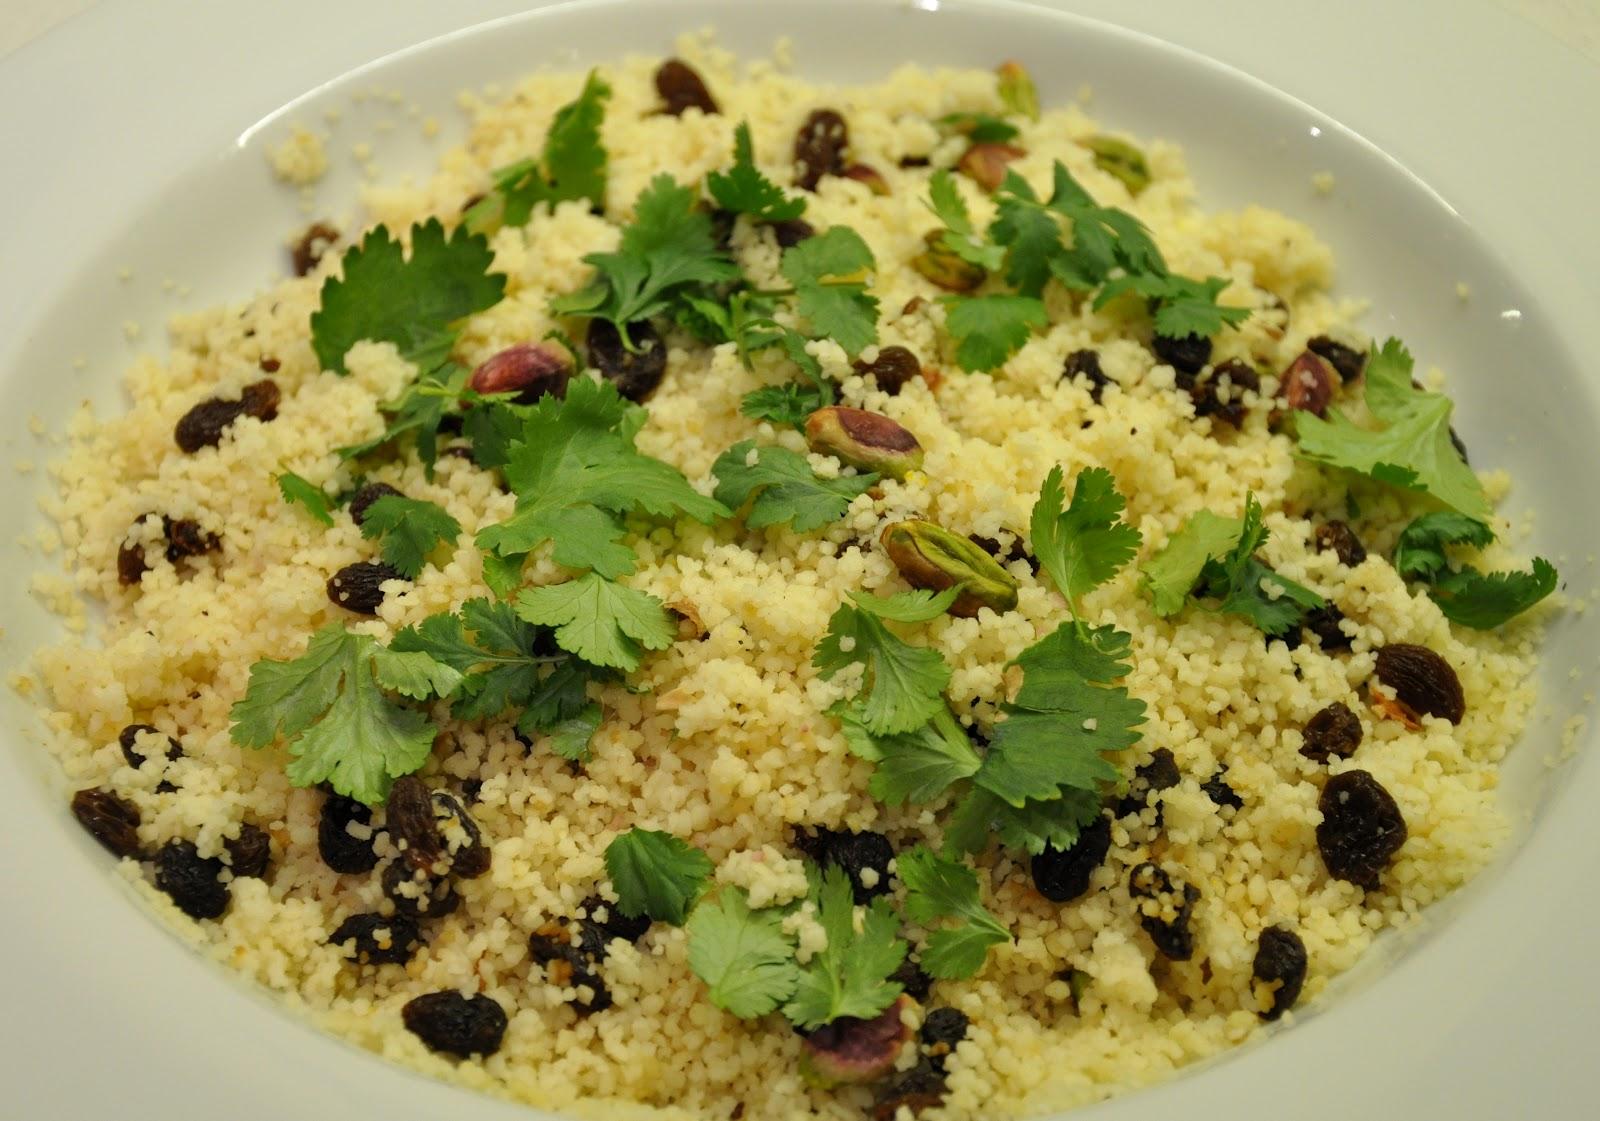 ... Artichoke and Green Olive Tagine, with Saffron and Pistachio Couscous